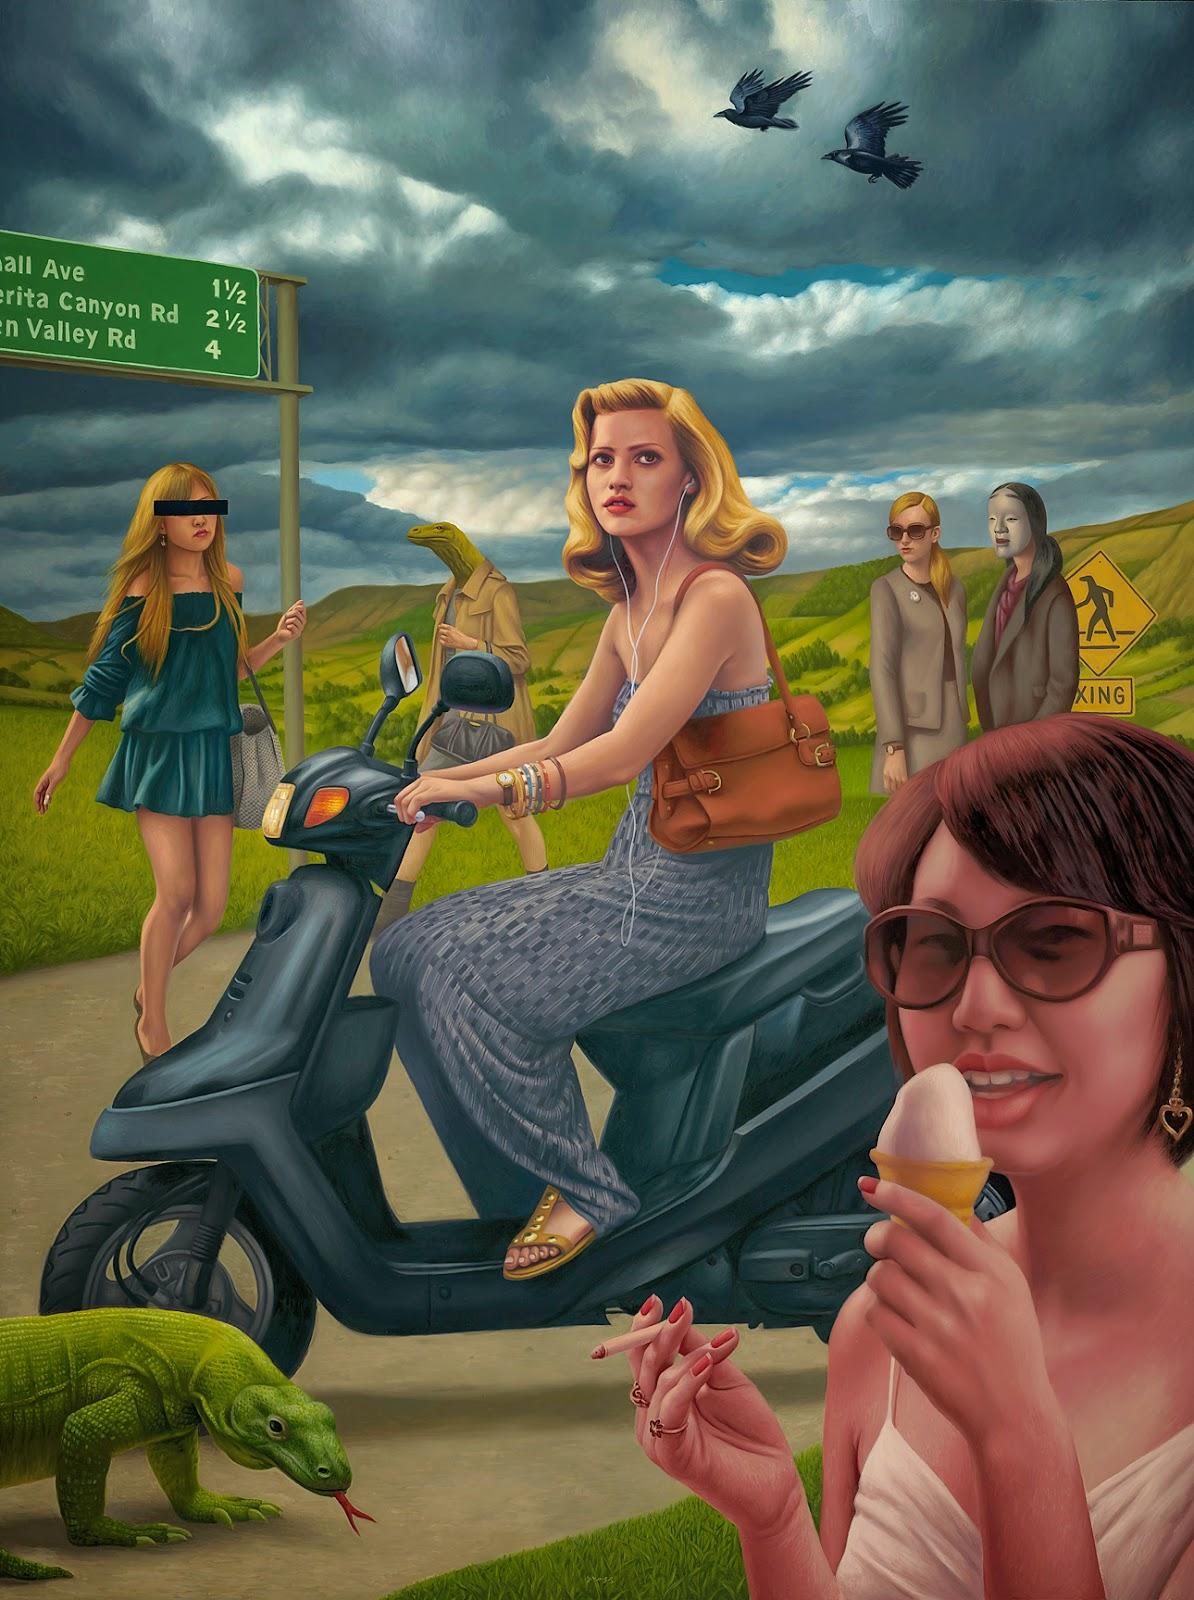 El surrealismo pop de Alex Gross